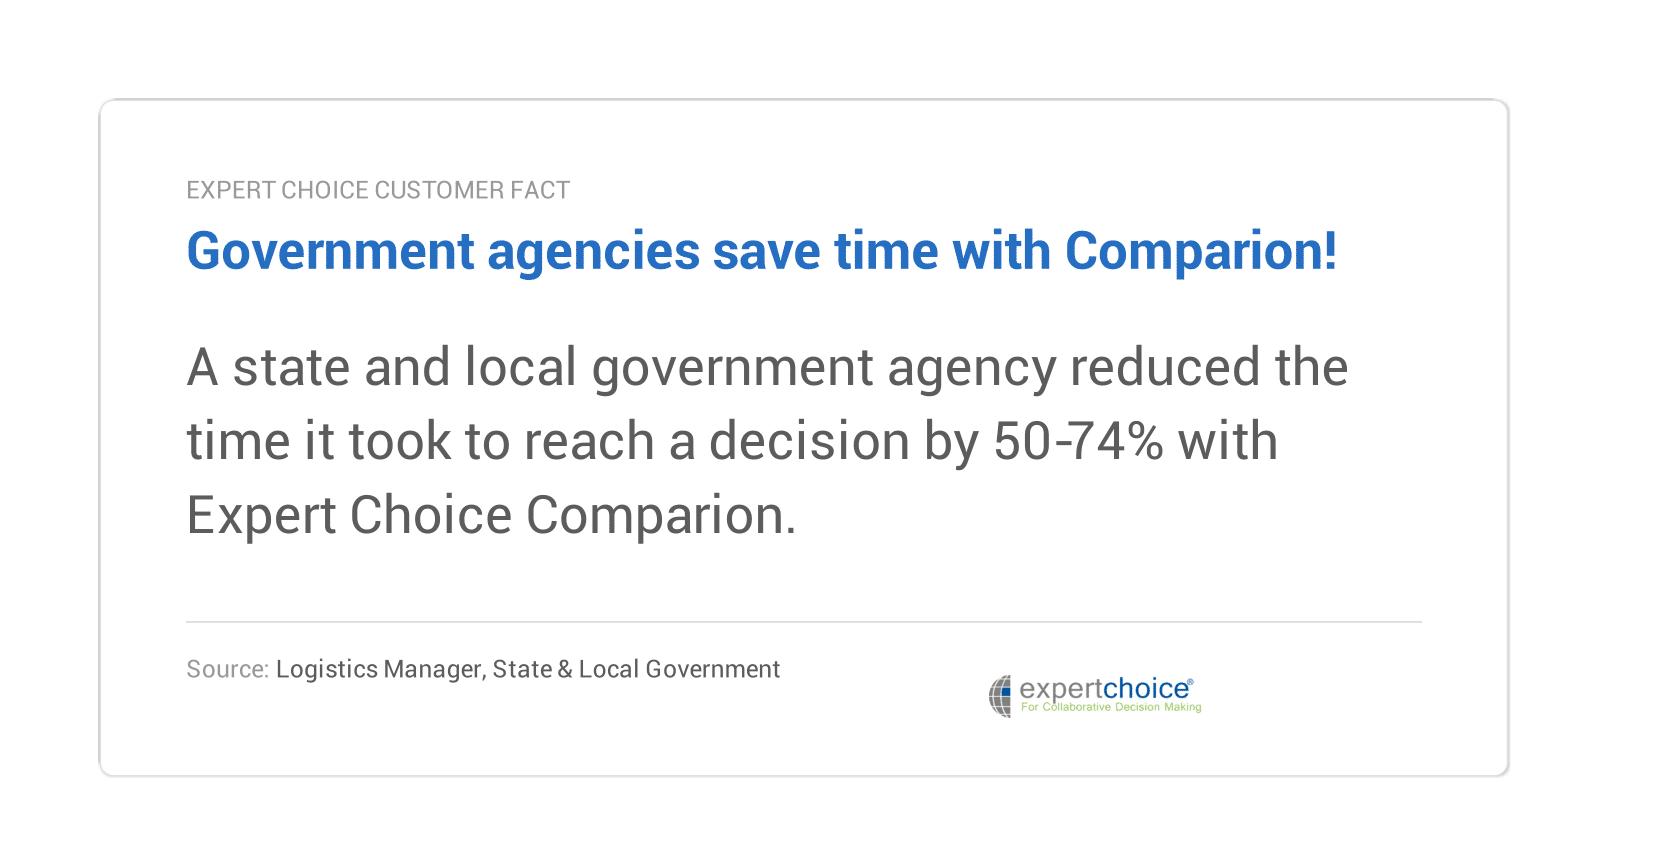 govt agencies save time